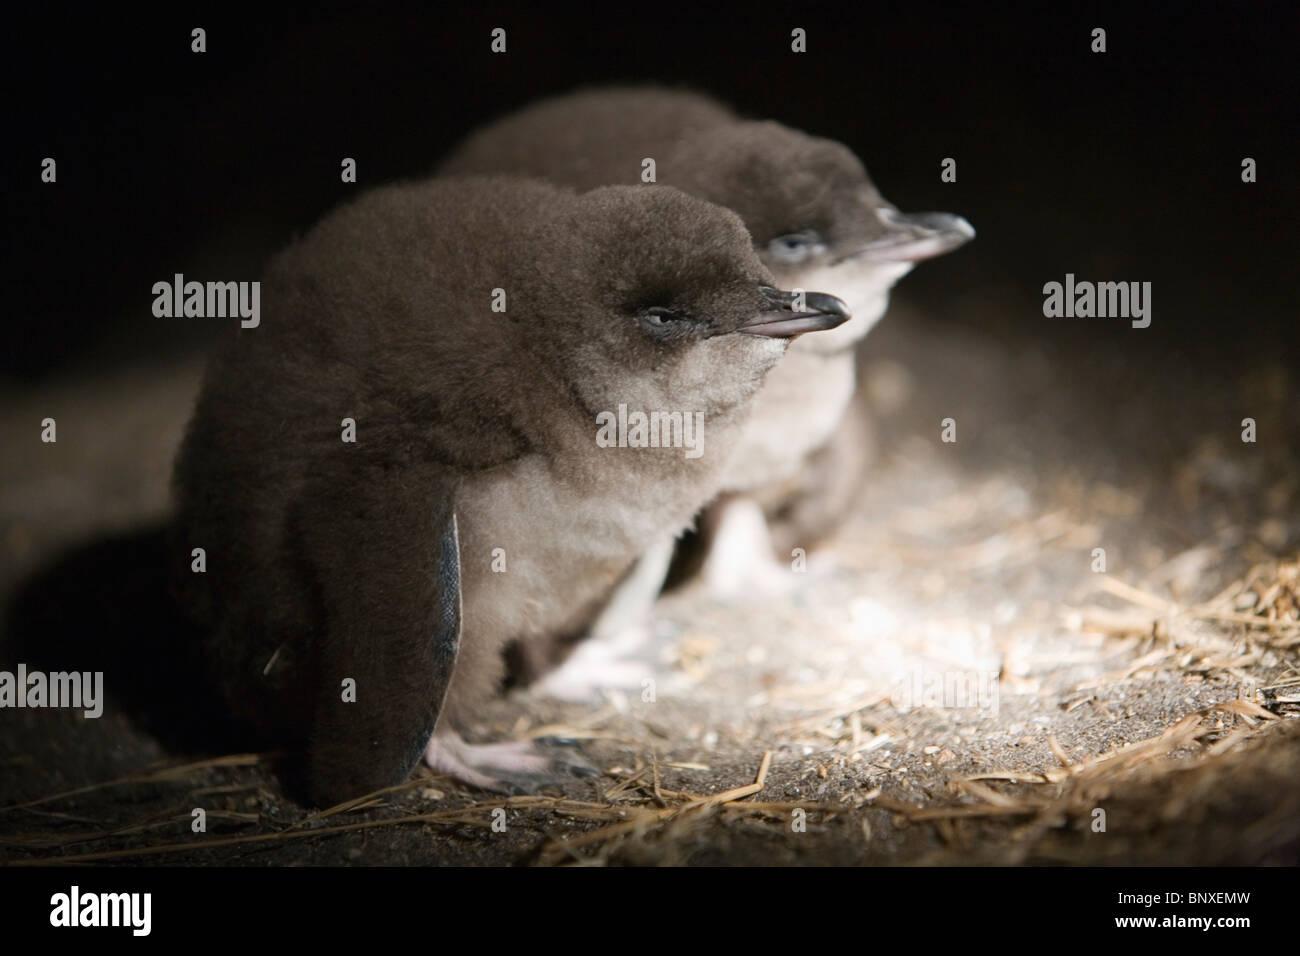 Baby Fairy penguins (Eudyptula minor).  Redbill Beach, Bicheno, Tasmania, AUSTRALIA - Stock Image